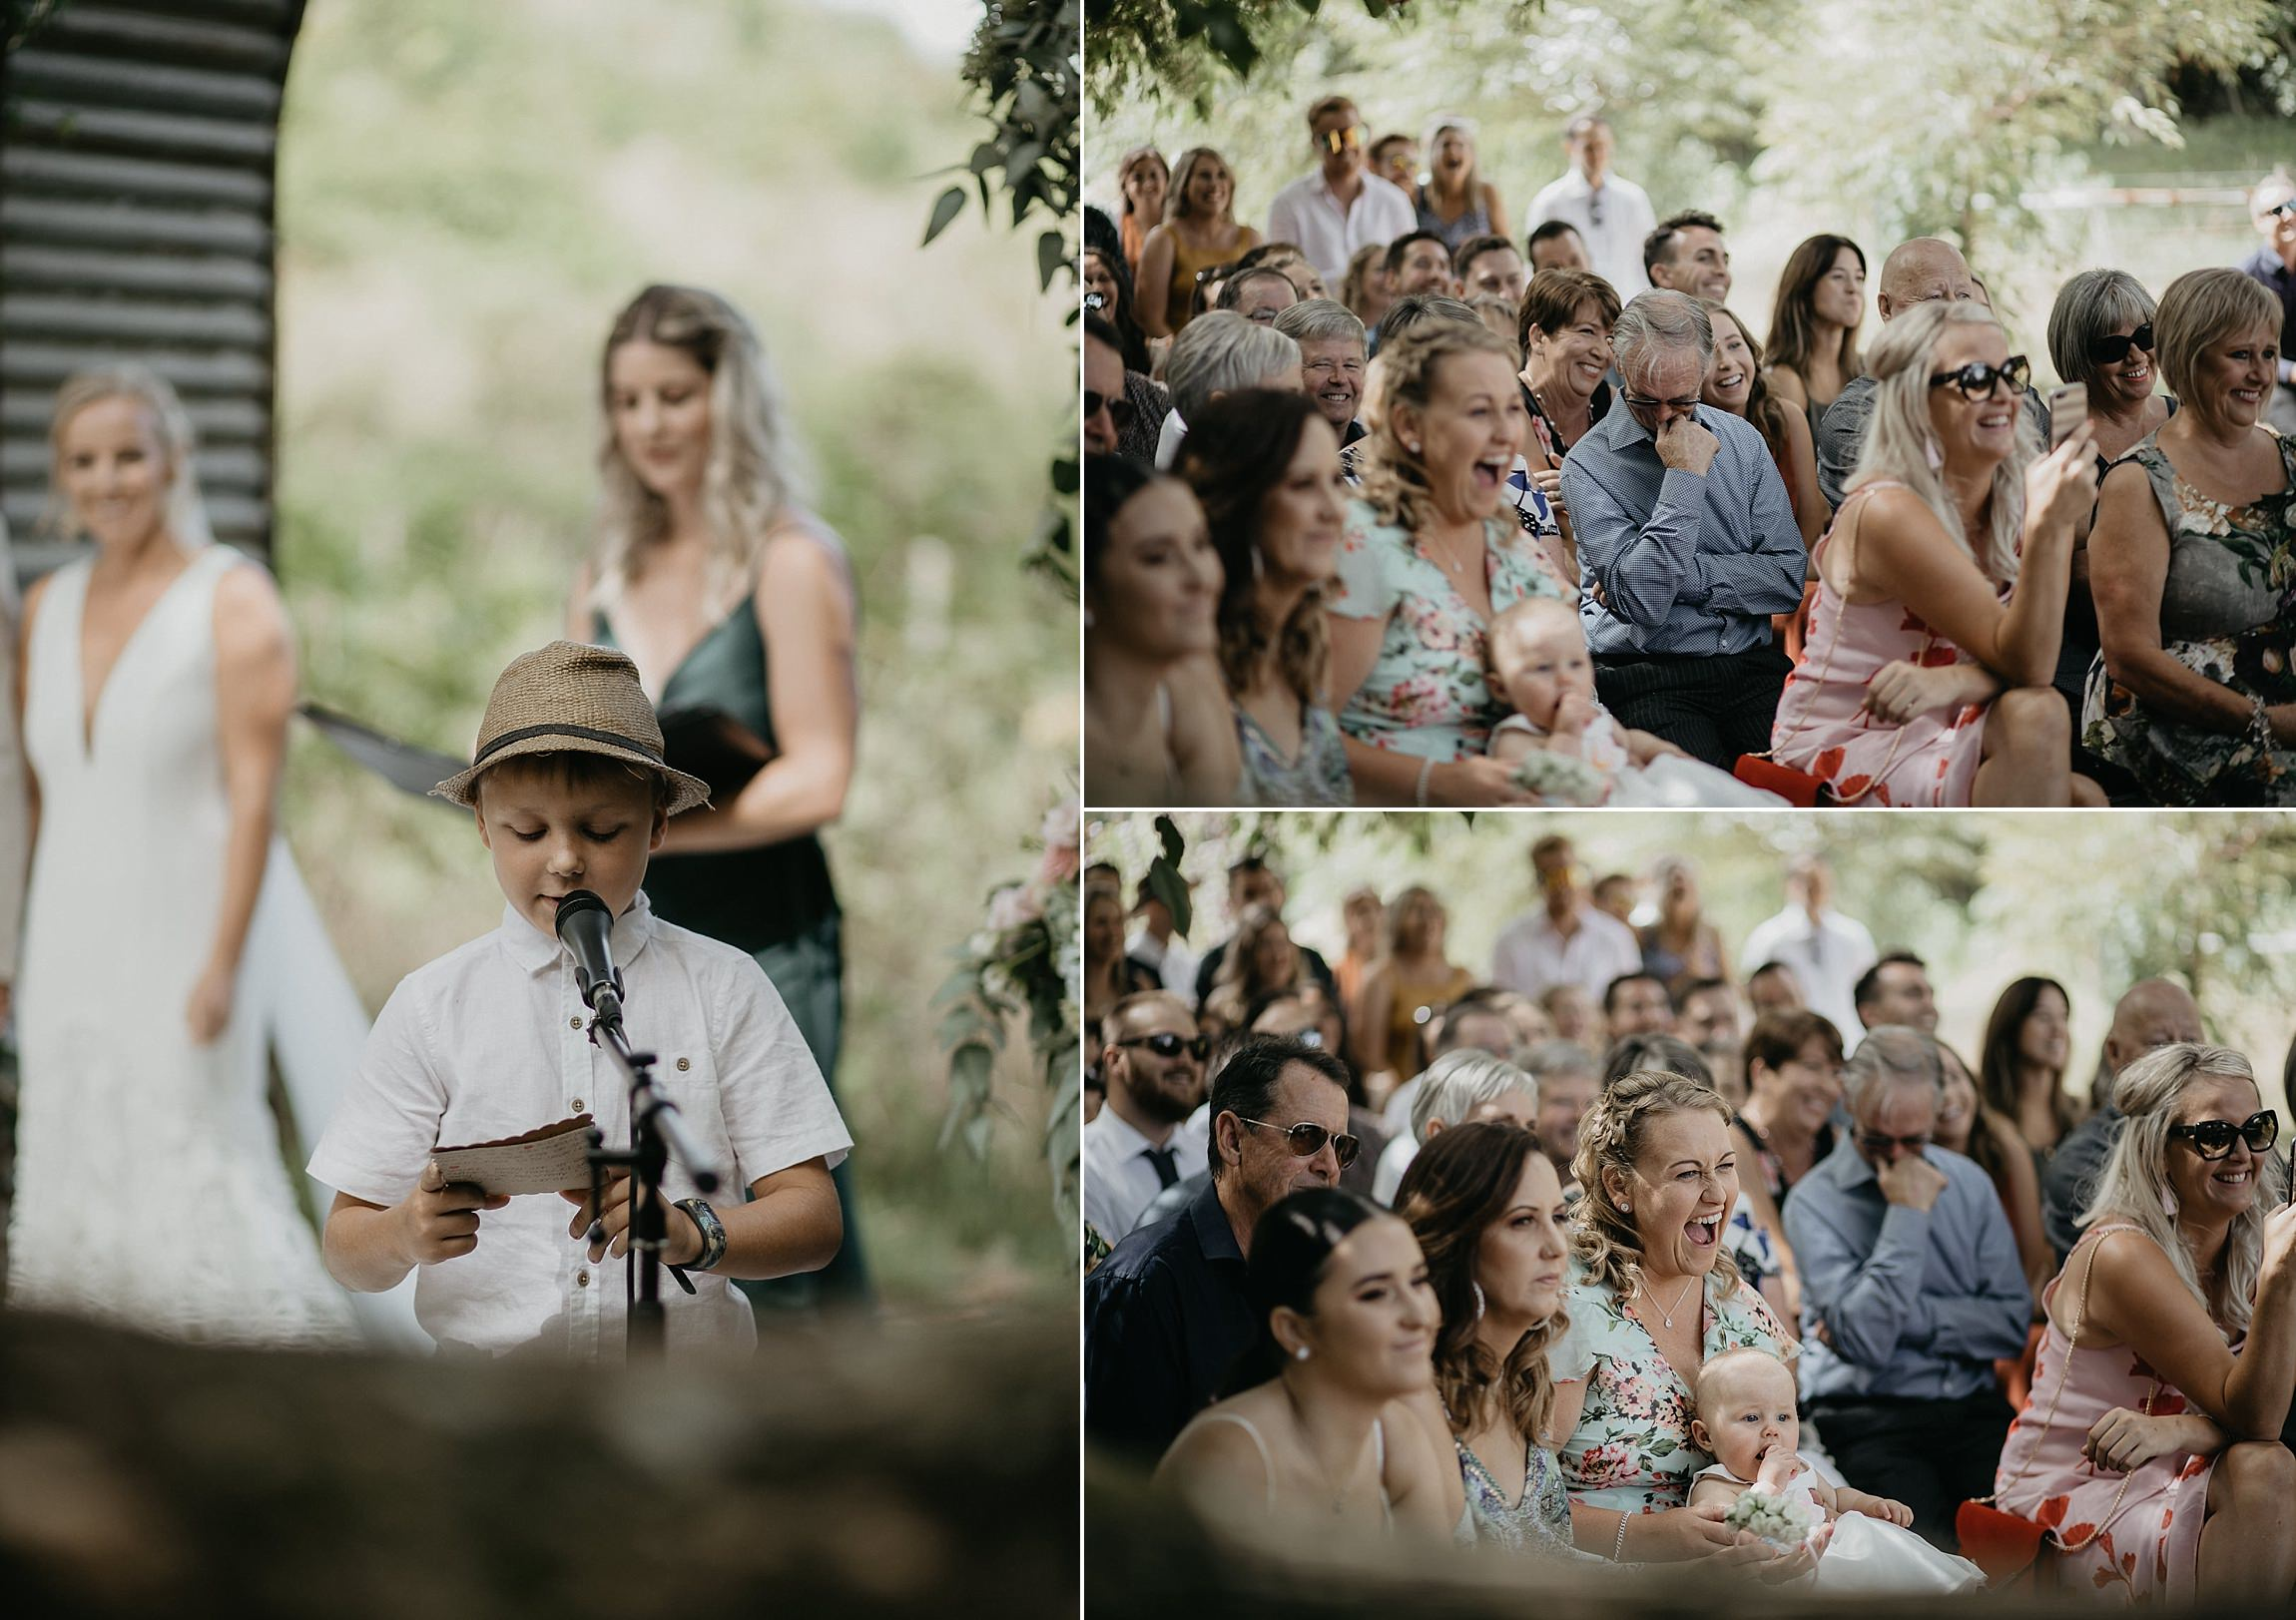 oldforestschool-wedding-blog-104.jpg